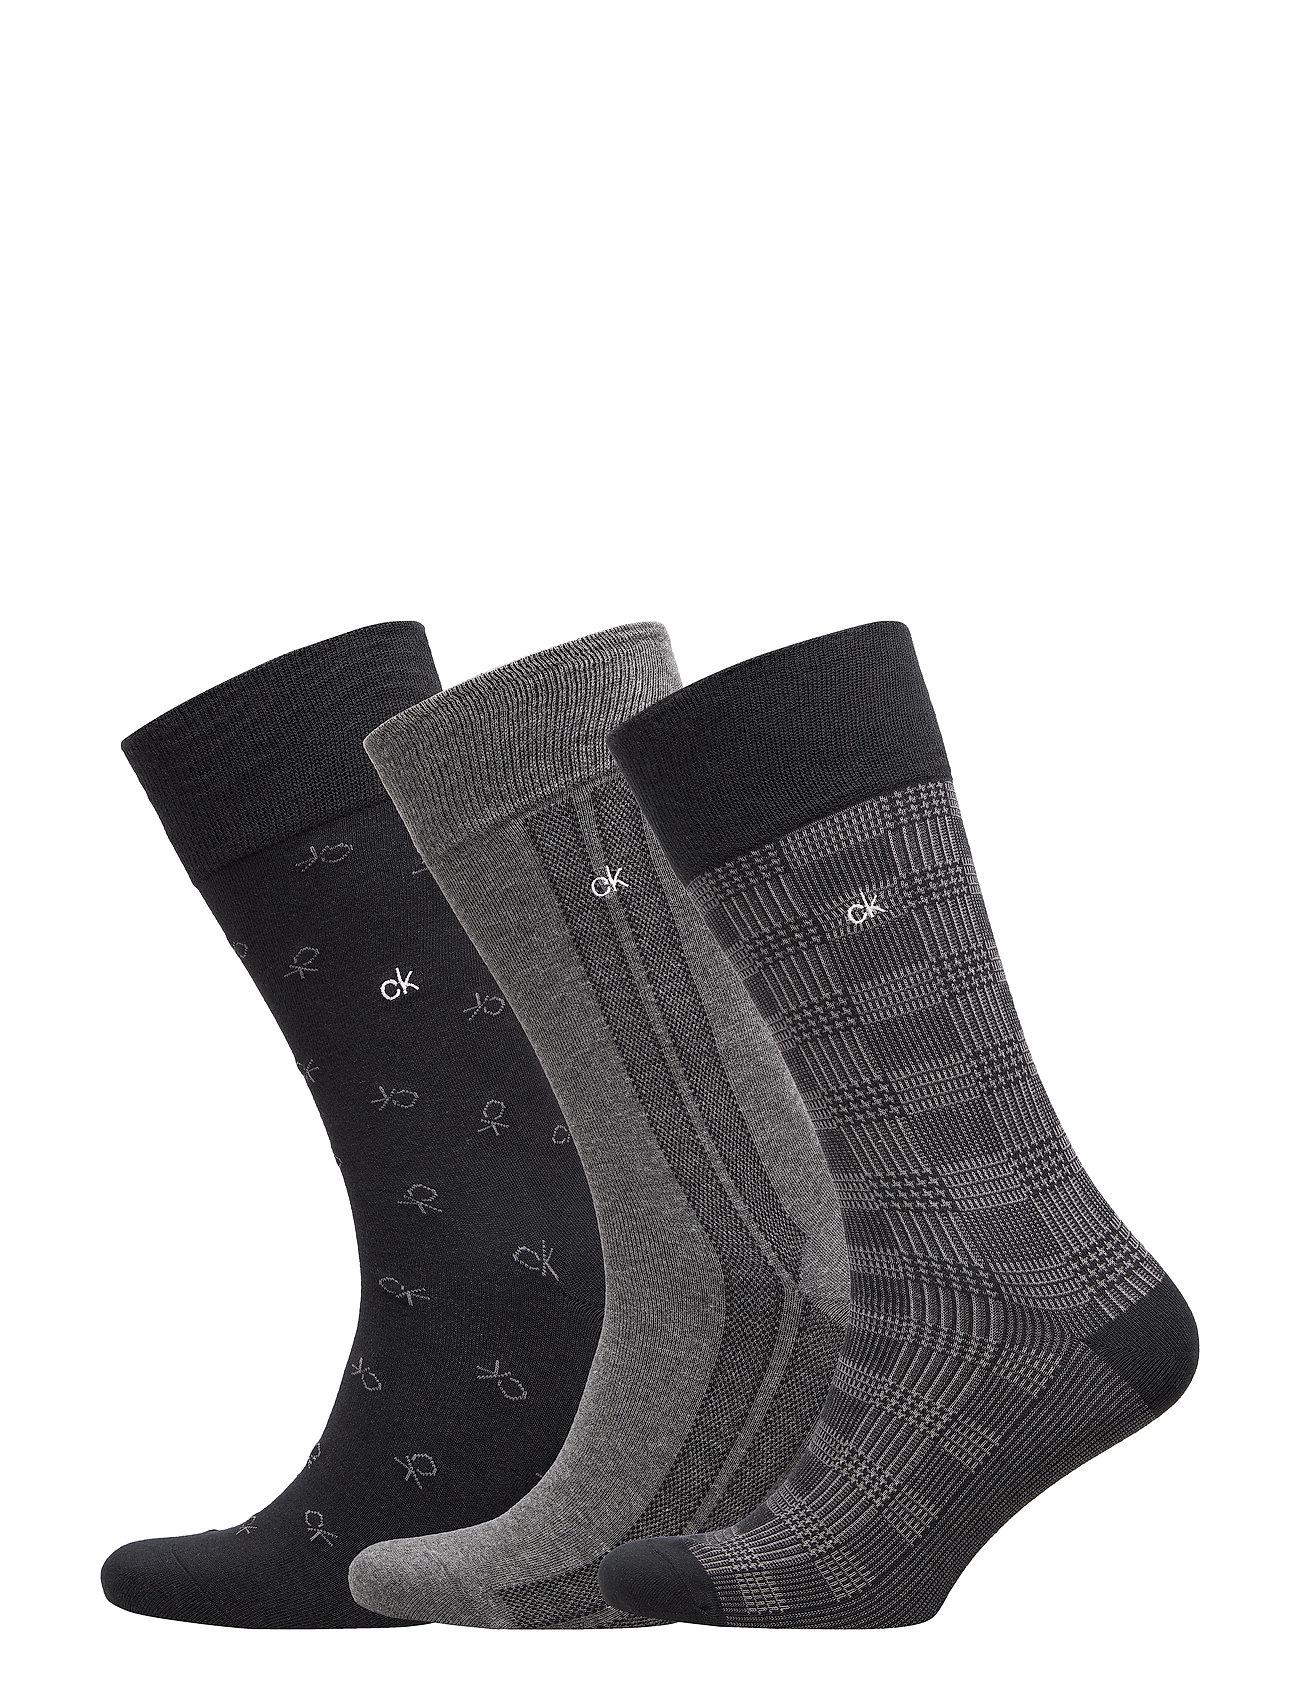 Calvin Klein CK 3PK TOMMY GIFT BOX CREW 96 - BLACK/CHARCOAL HTR/BLACK